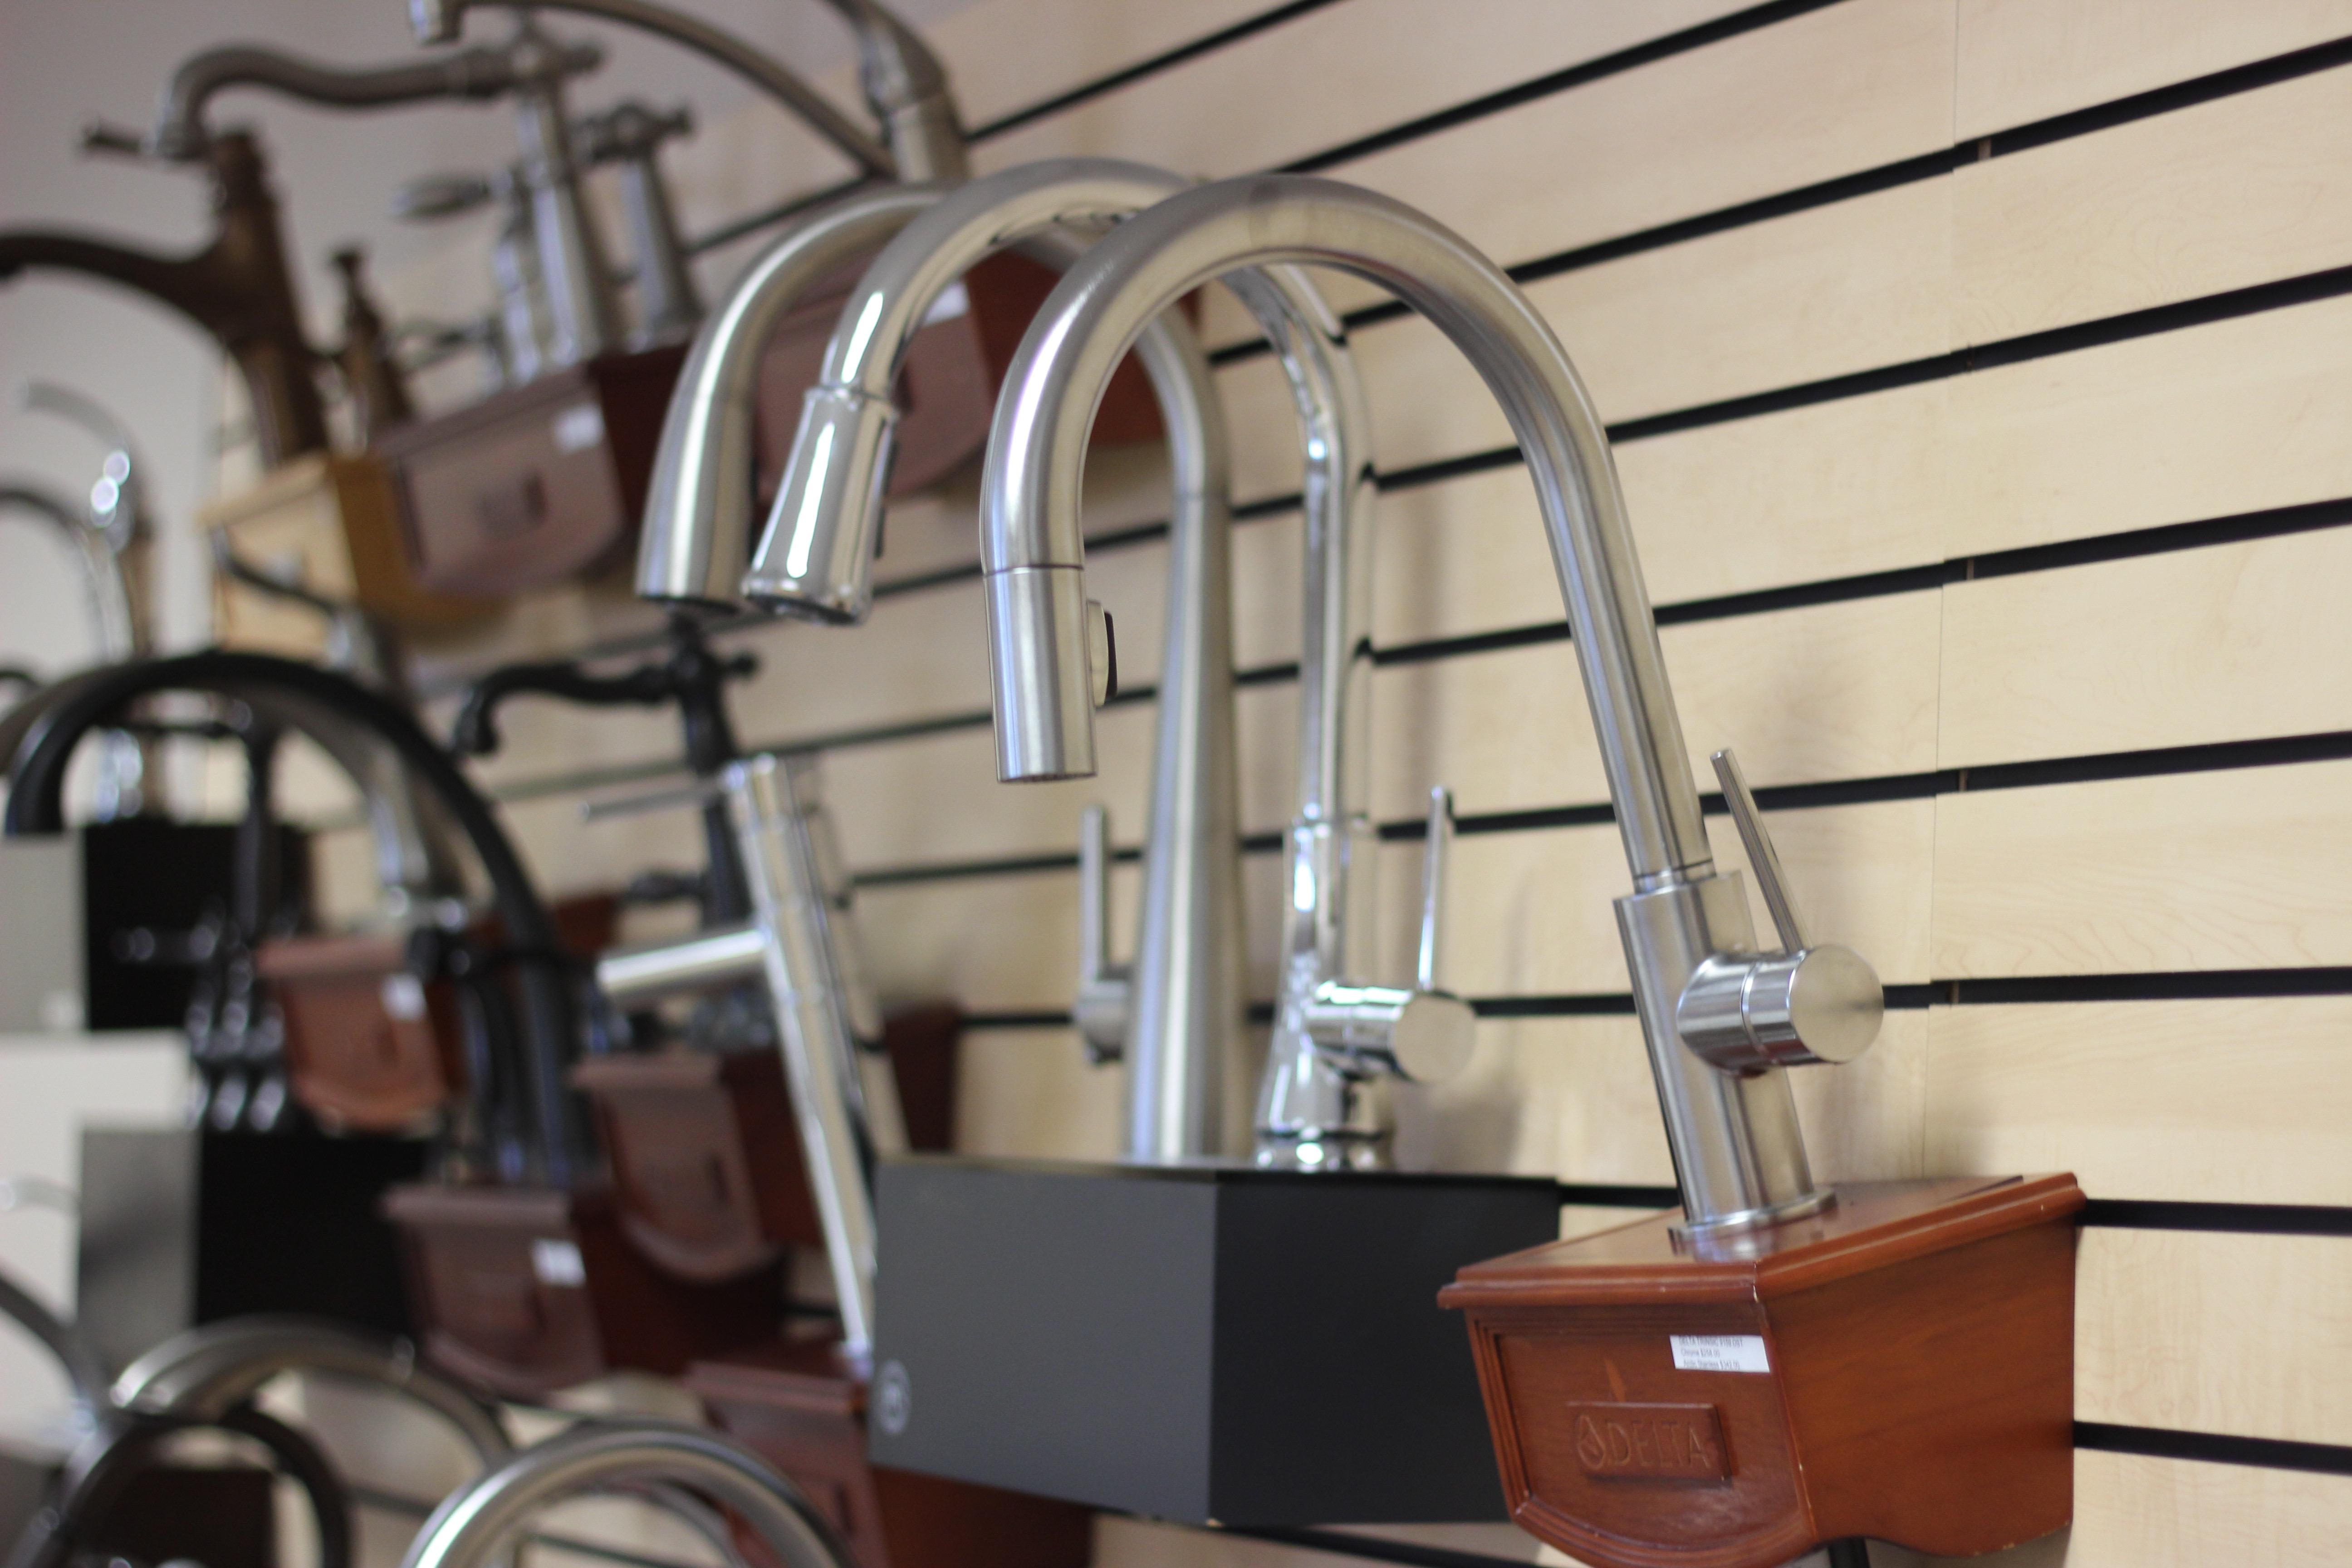 Faucets on display at the Van's Plumbing & Electric showroom in Lynden, WA.